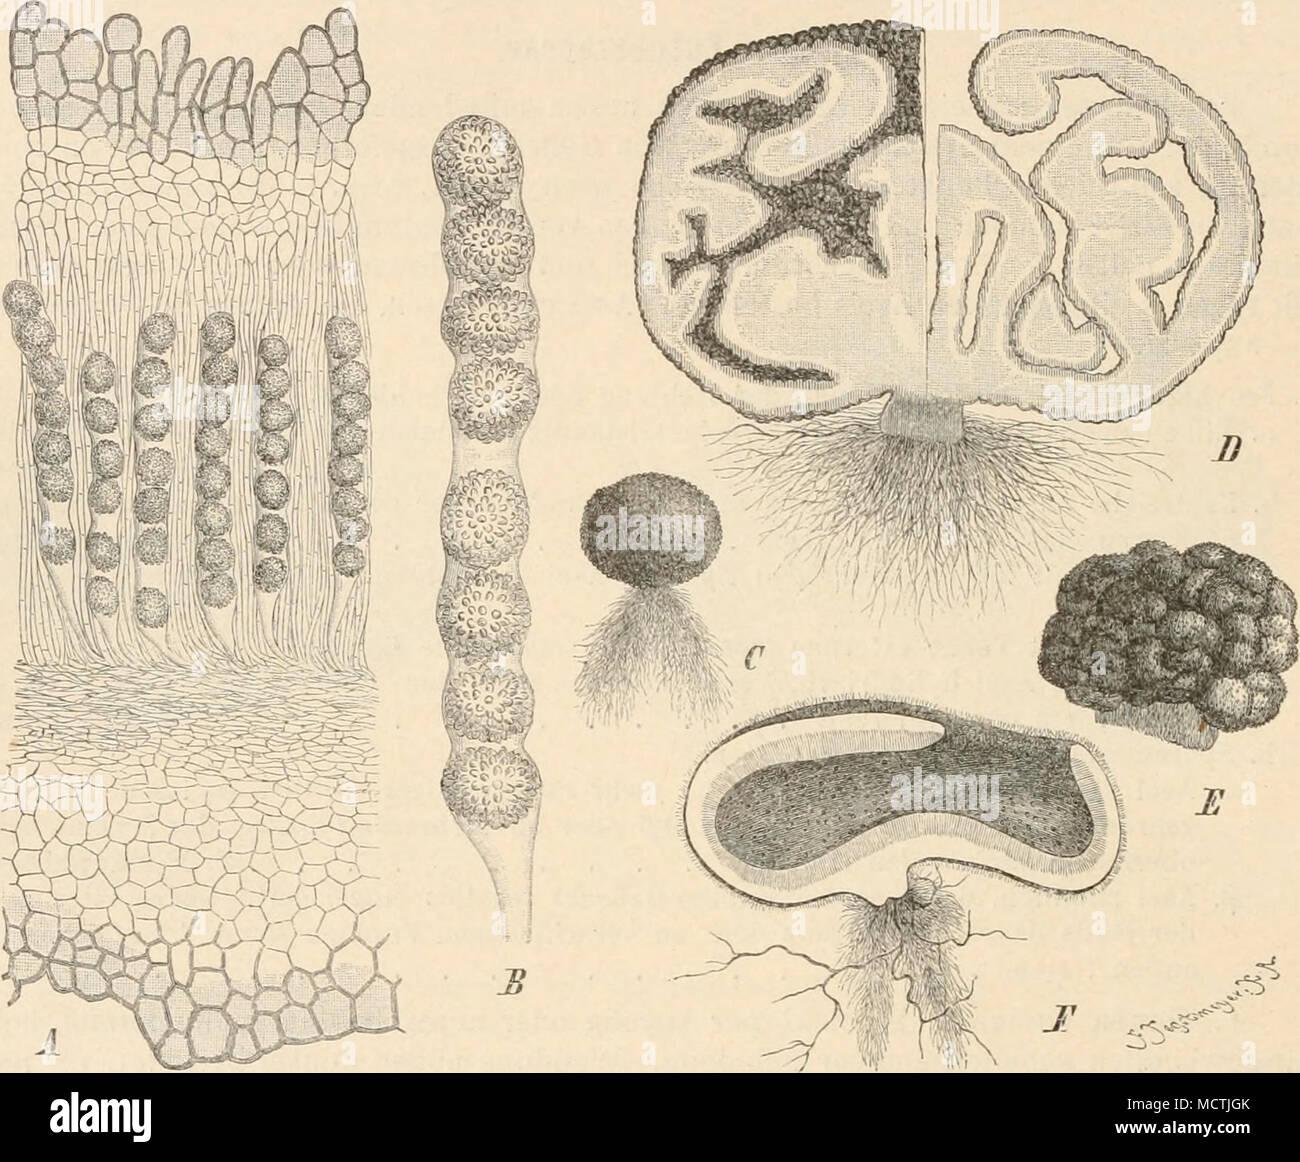 Gemütlich Curica Greys Anatomy Ideen - Anatomie Ideen - finotti.info